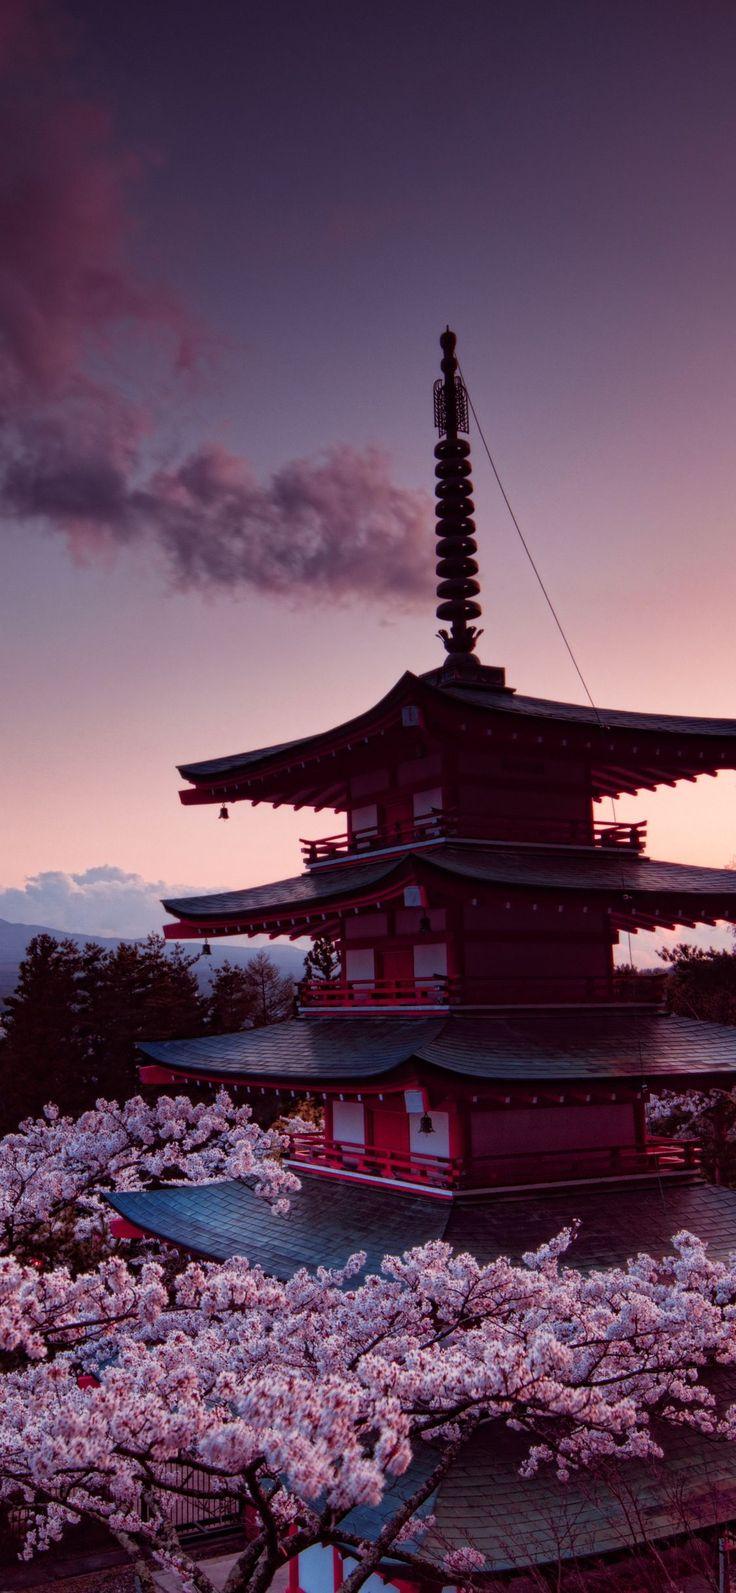 1125x2436 1125x2436 Churei Tower Mount Fuji In Japan 8k Iphone X Iphone 10 Hd Japanese Wallpaper Iphone Iphone Wallpaper Japan Hd Nature Wallpapers